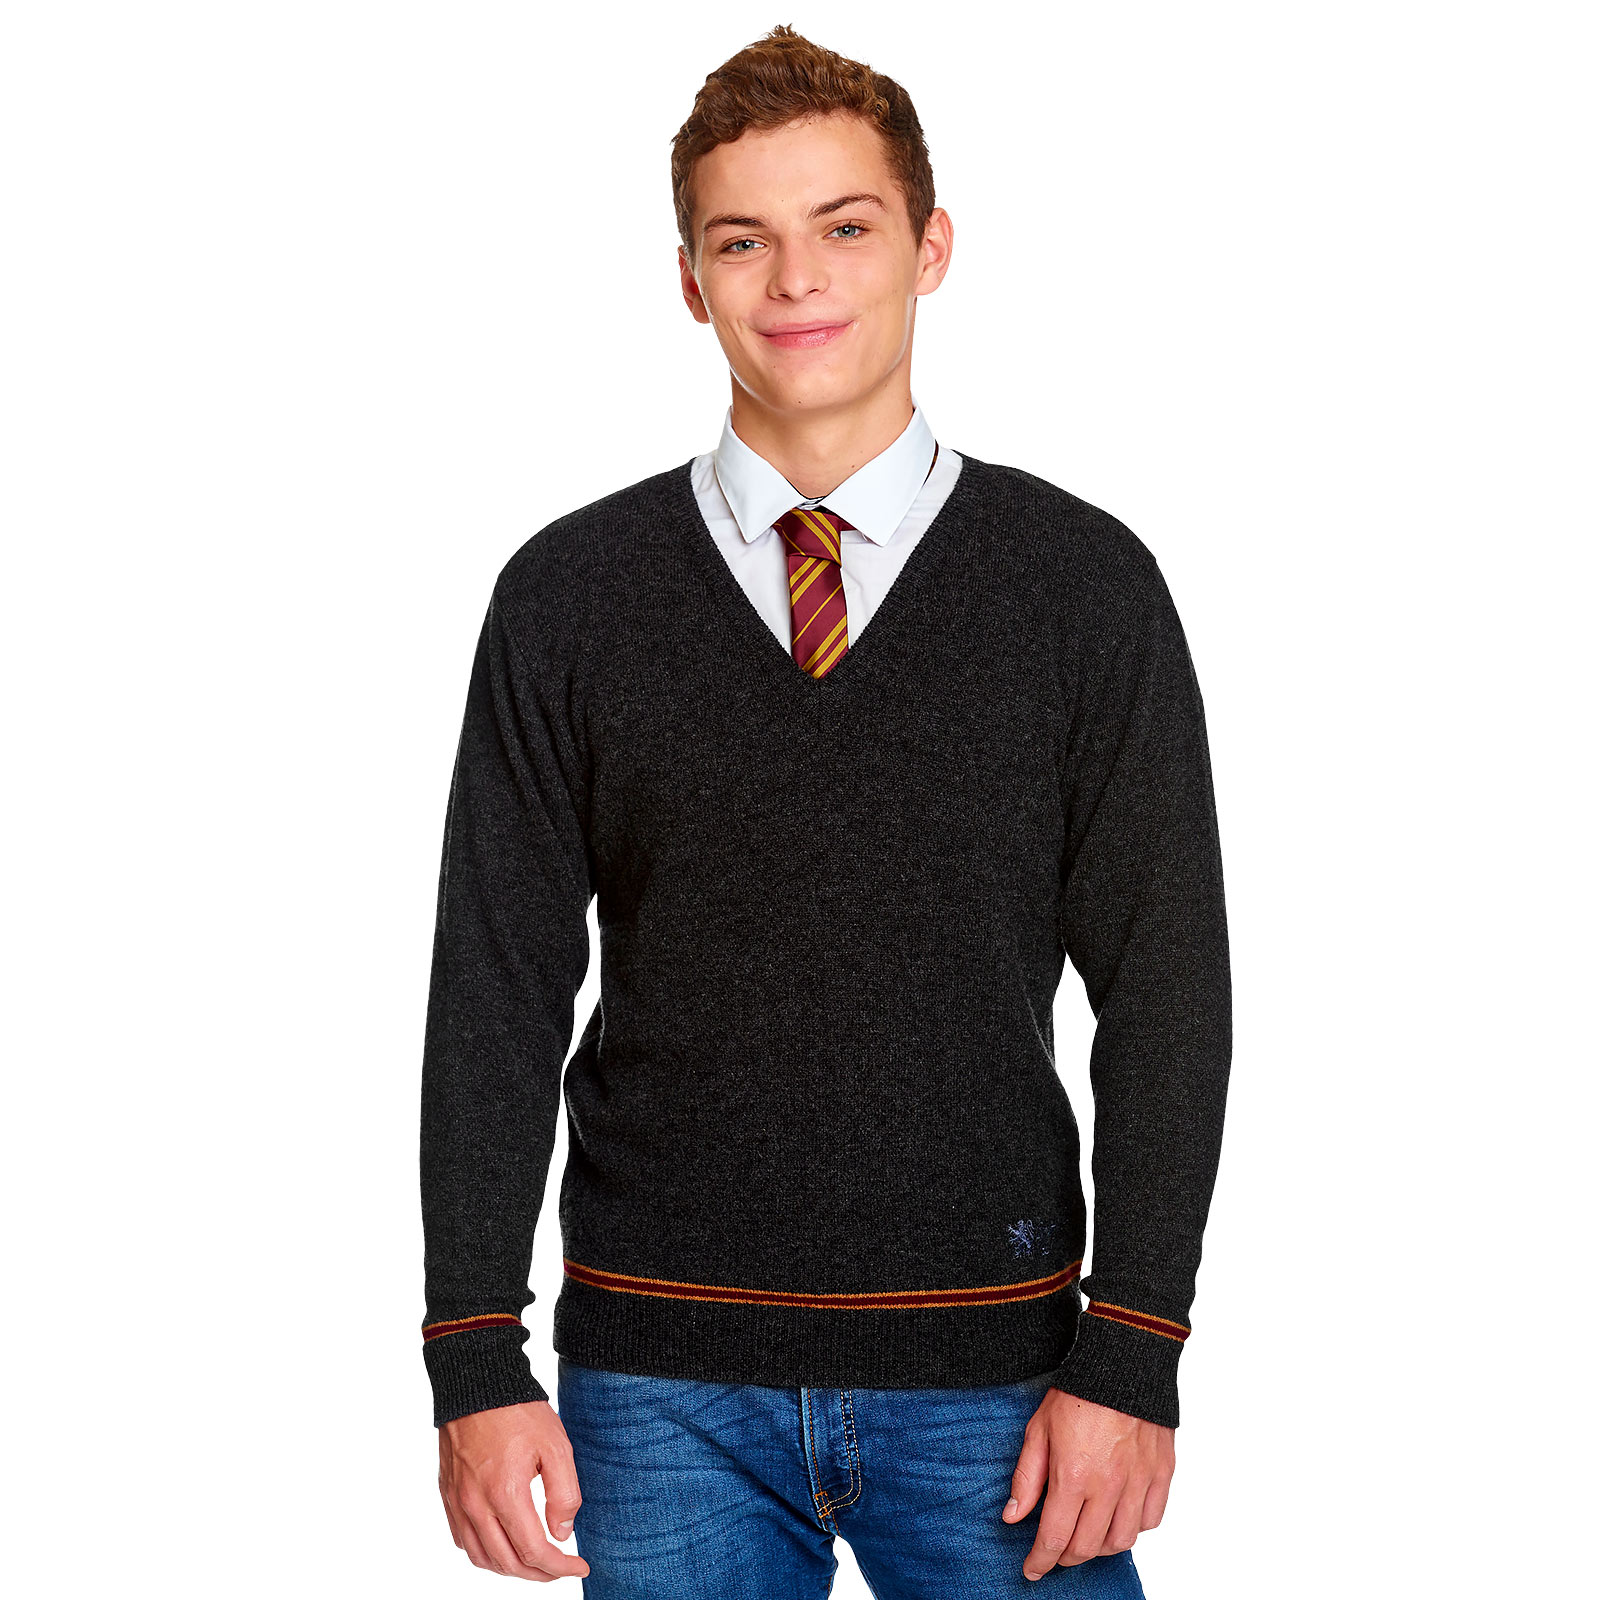 Harry Potter - Gryffindor Sweater